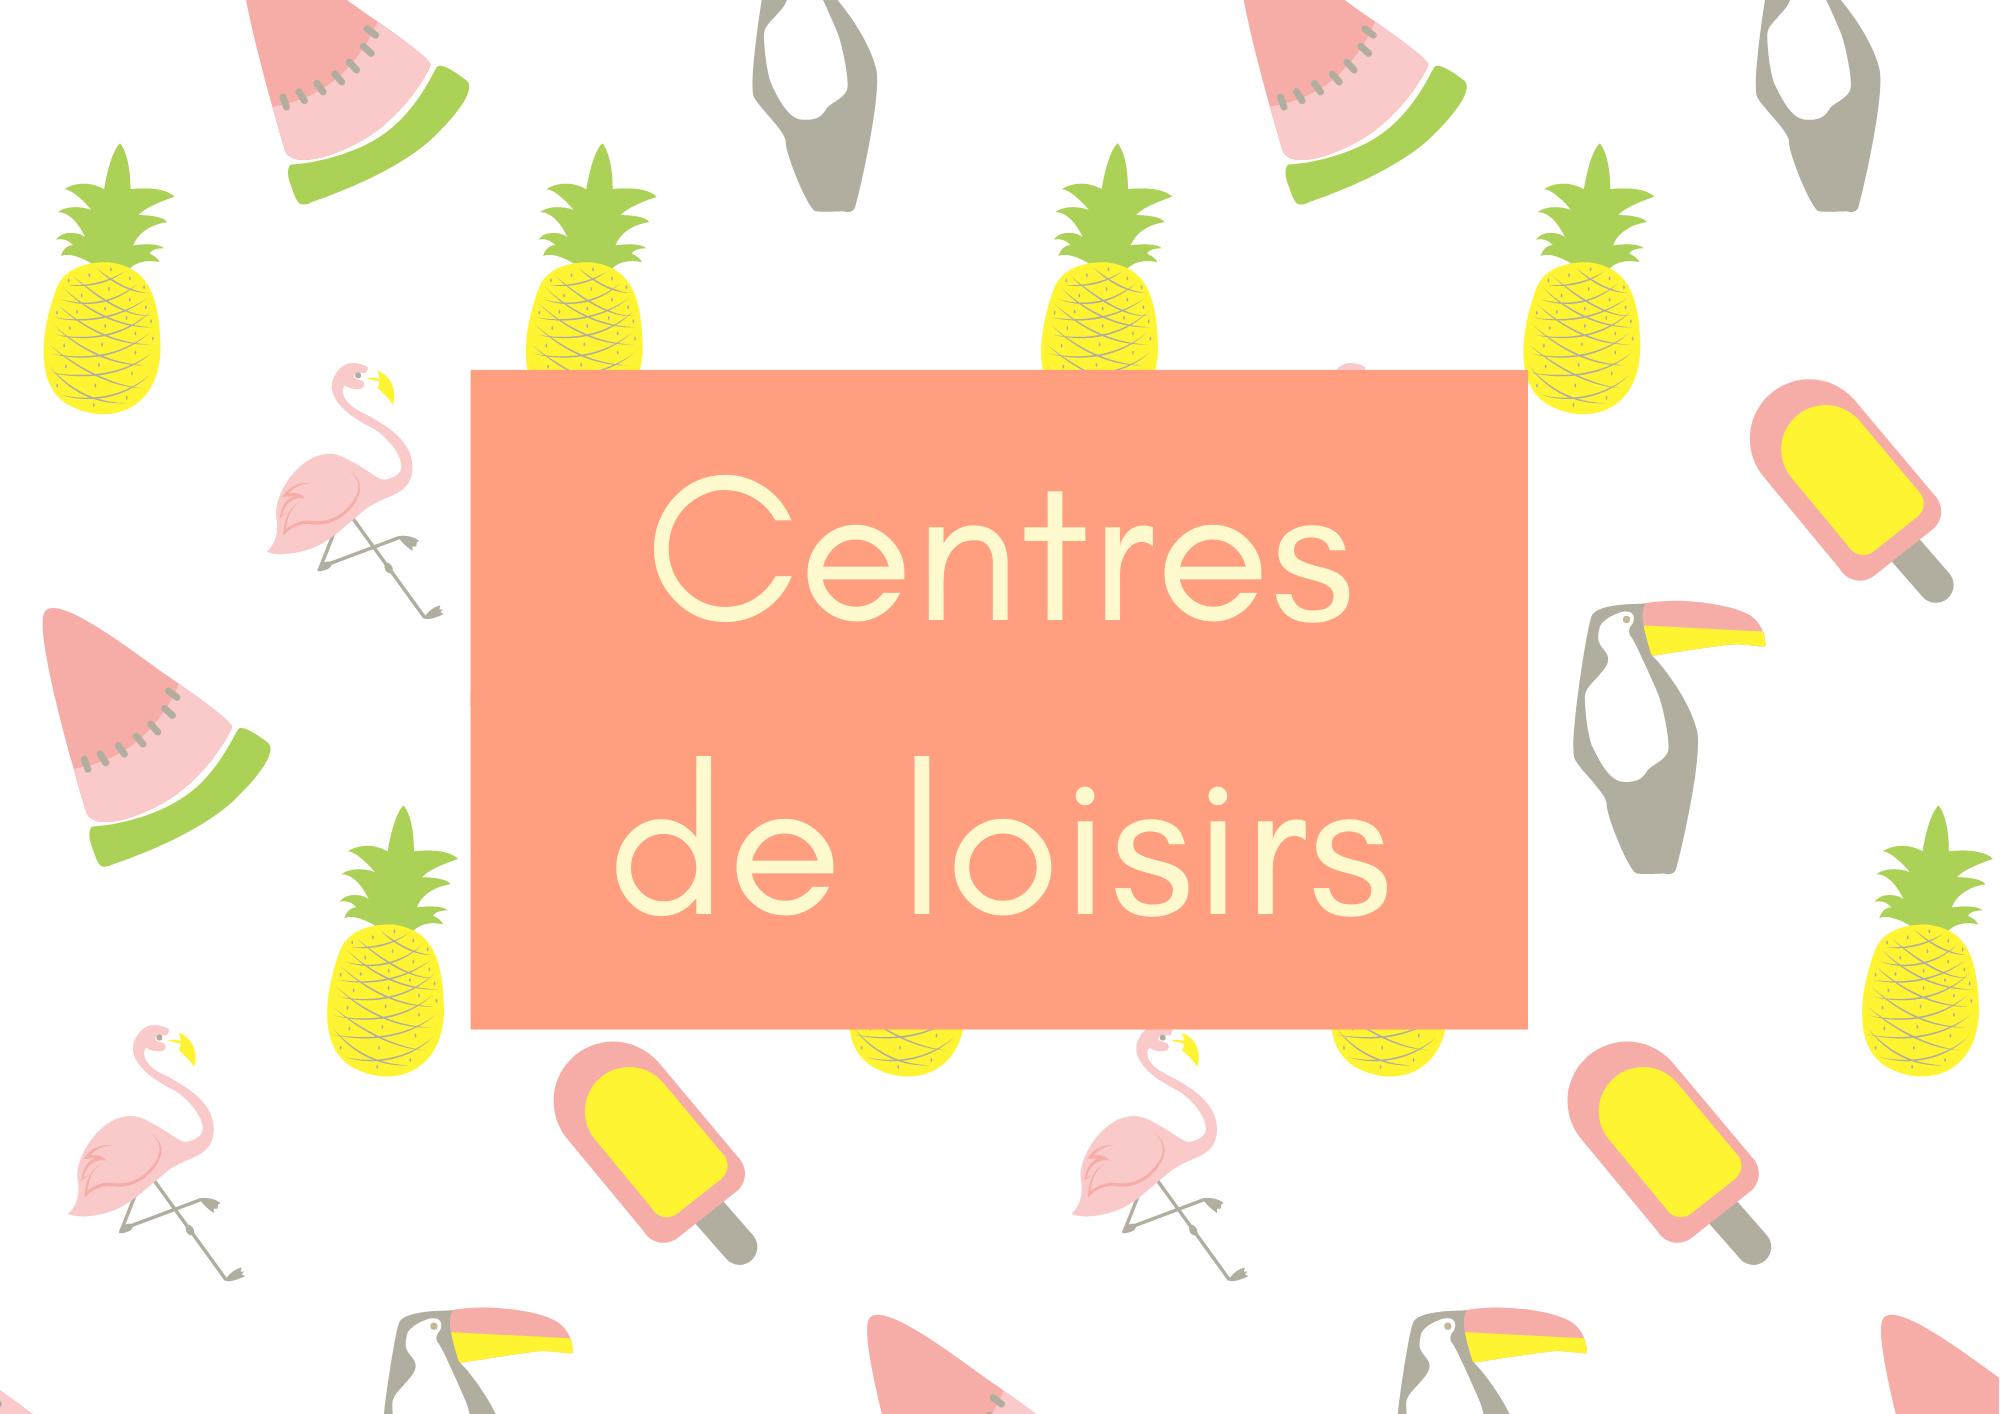 Centres de loisirs